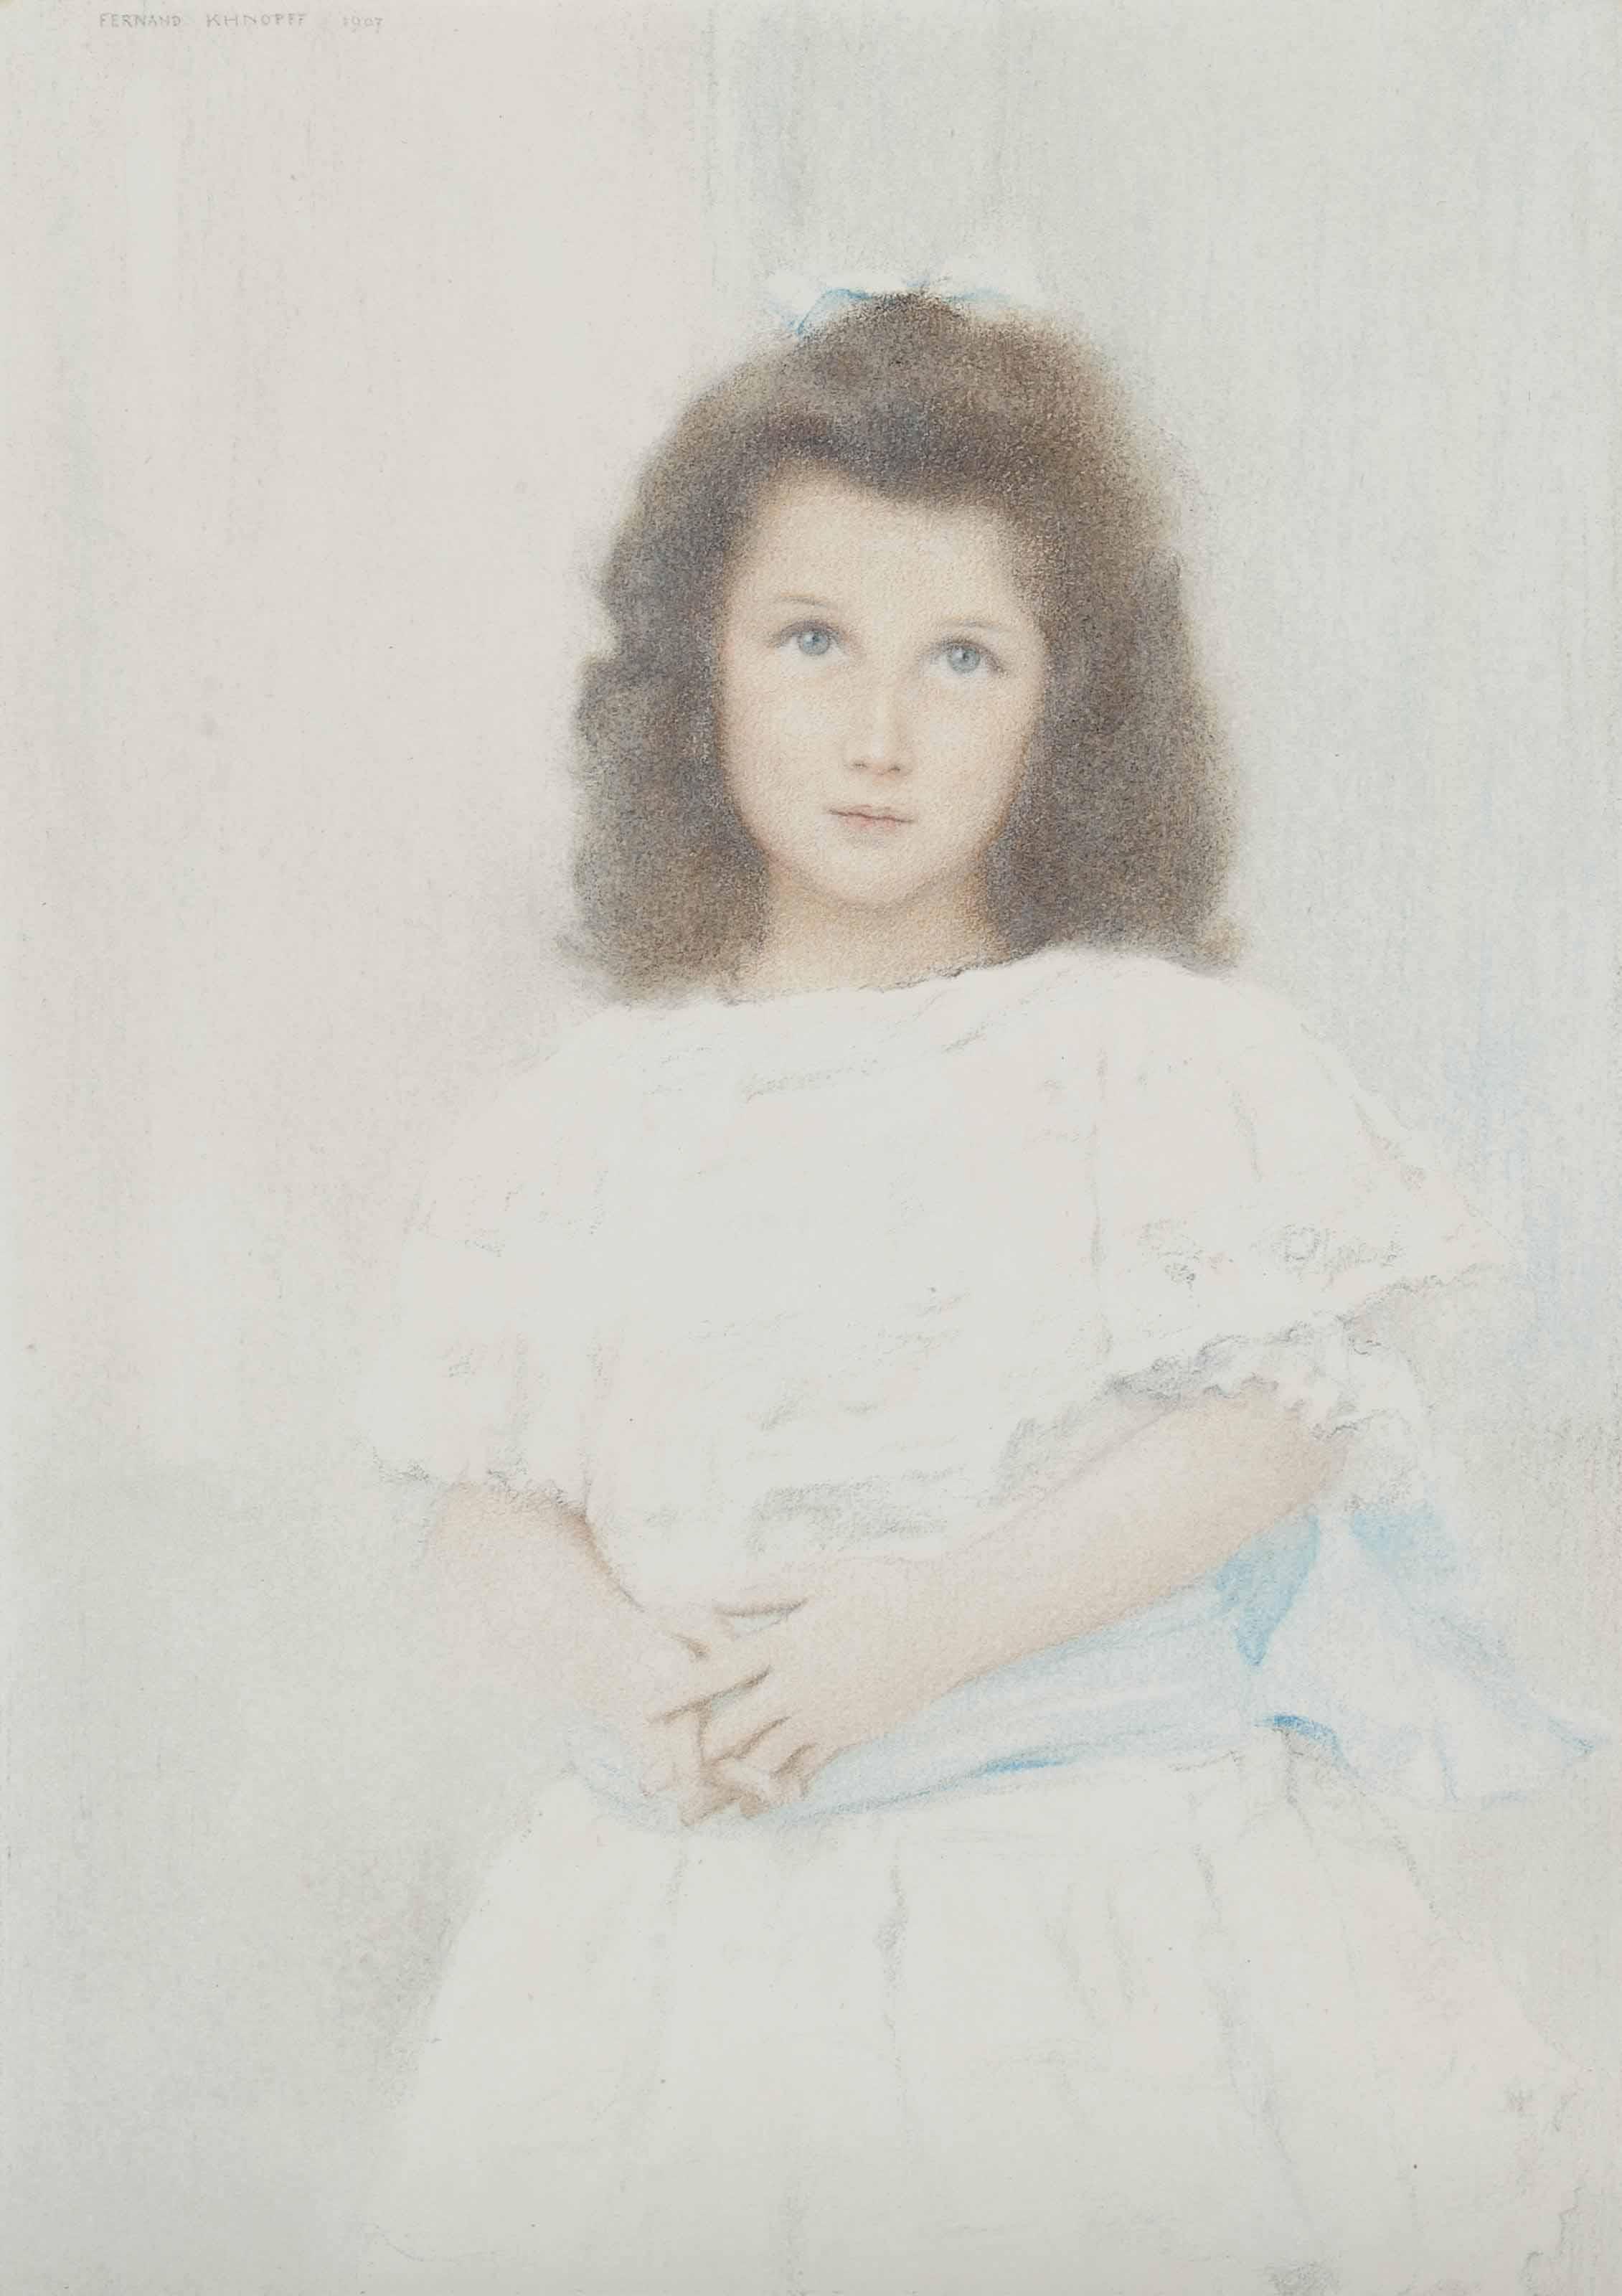 Portrait of a Renée Lambert de Rothschild, daughter of the founder of the Lambert bank